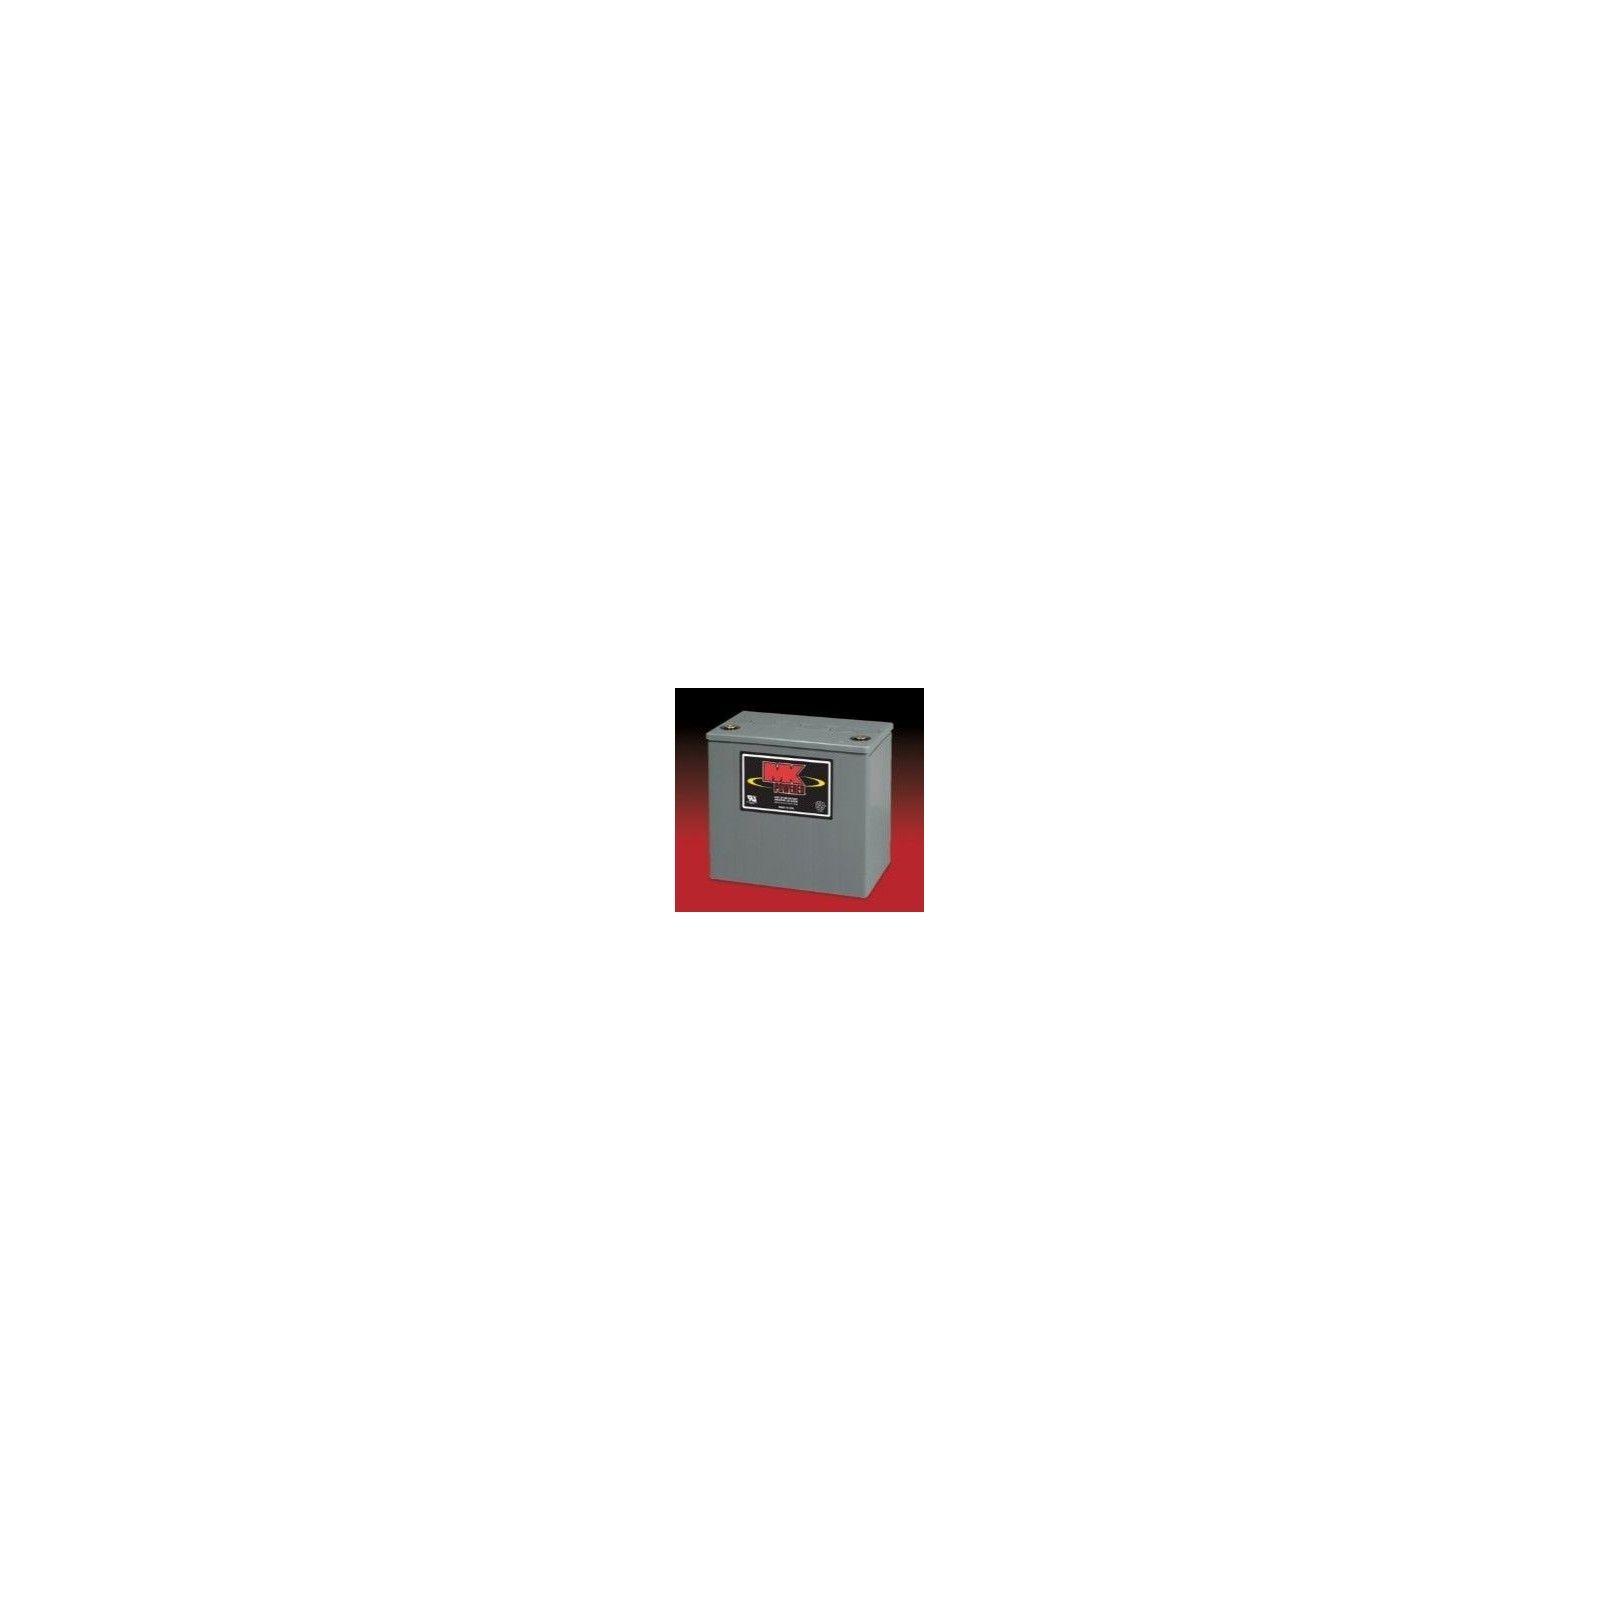 Batería MK M22NF-HC 48.4Ah 12V Agm MK - 1